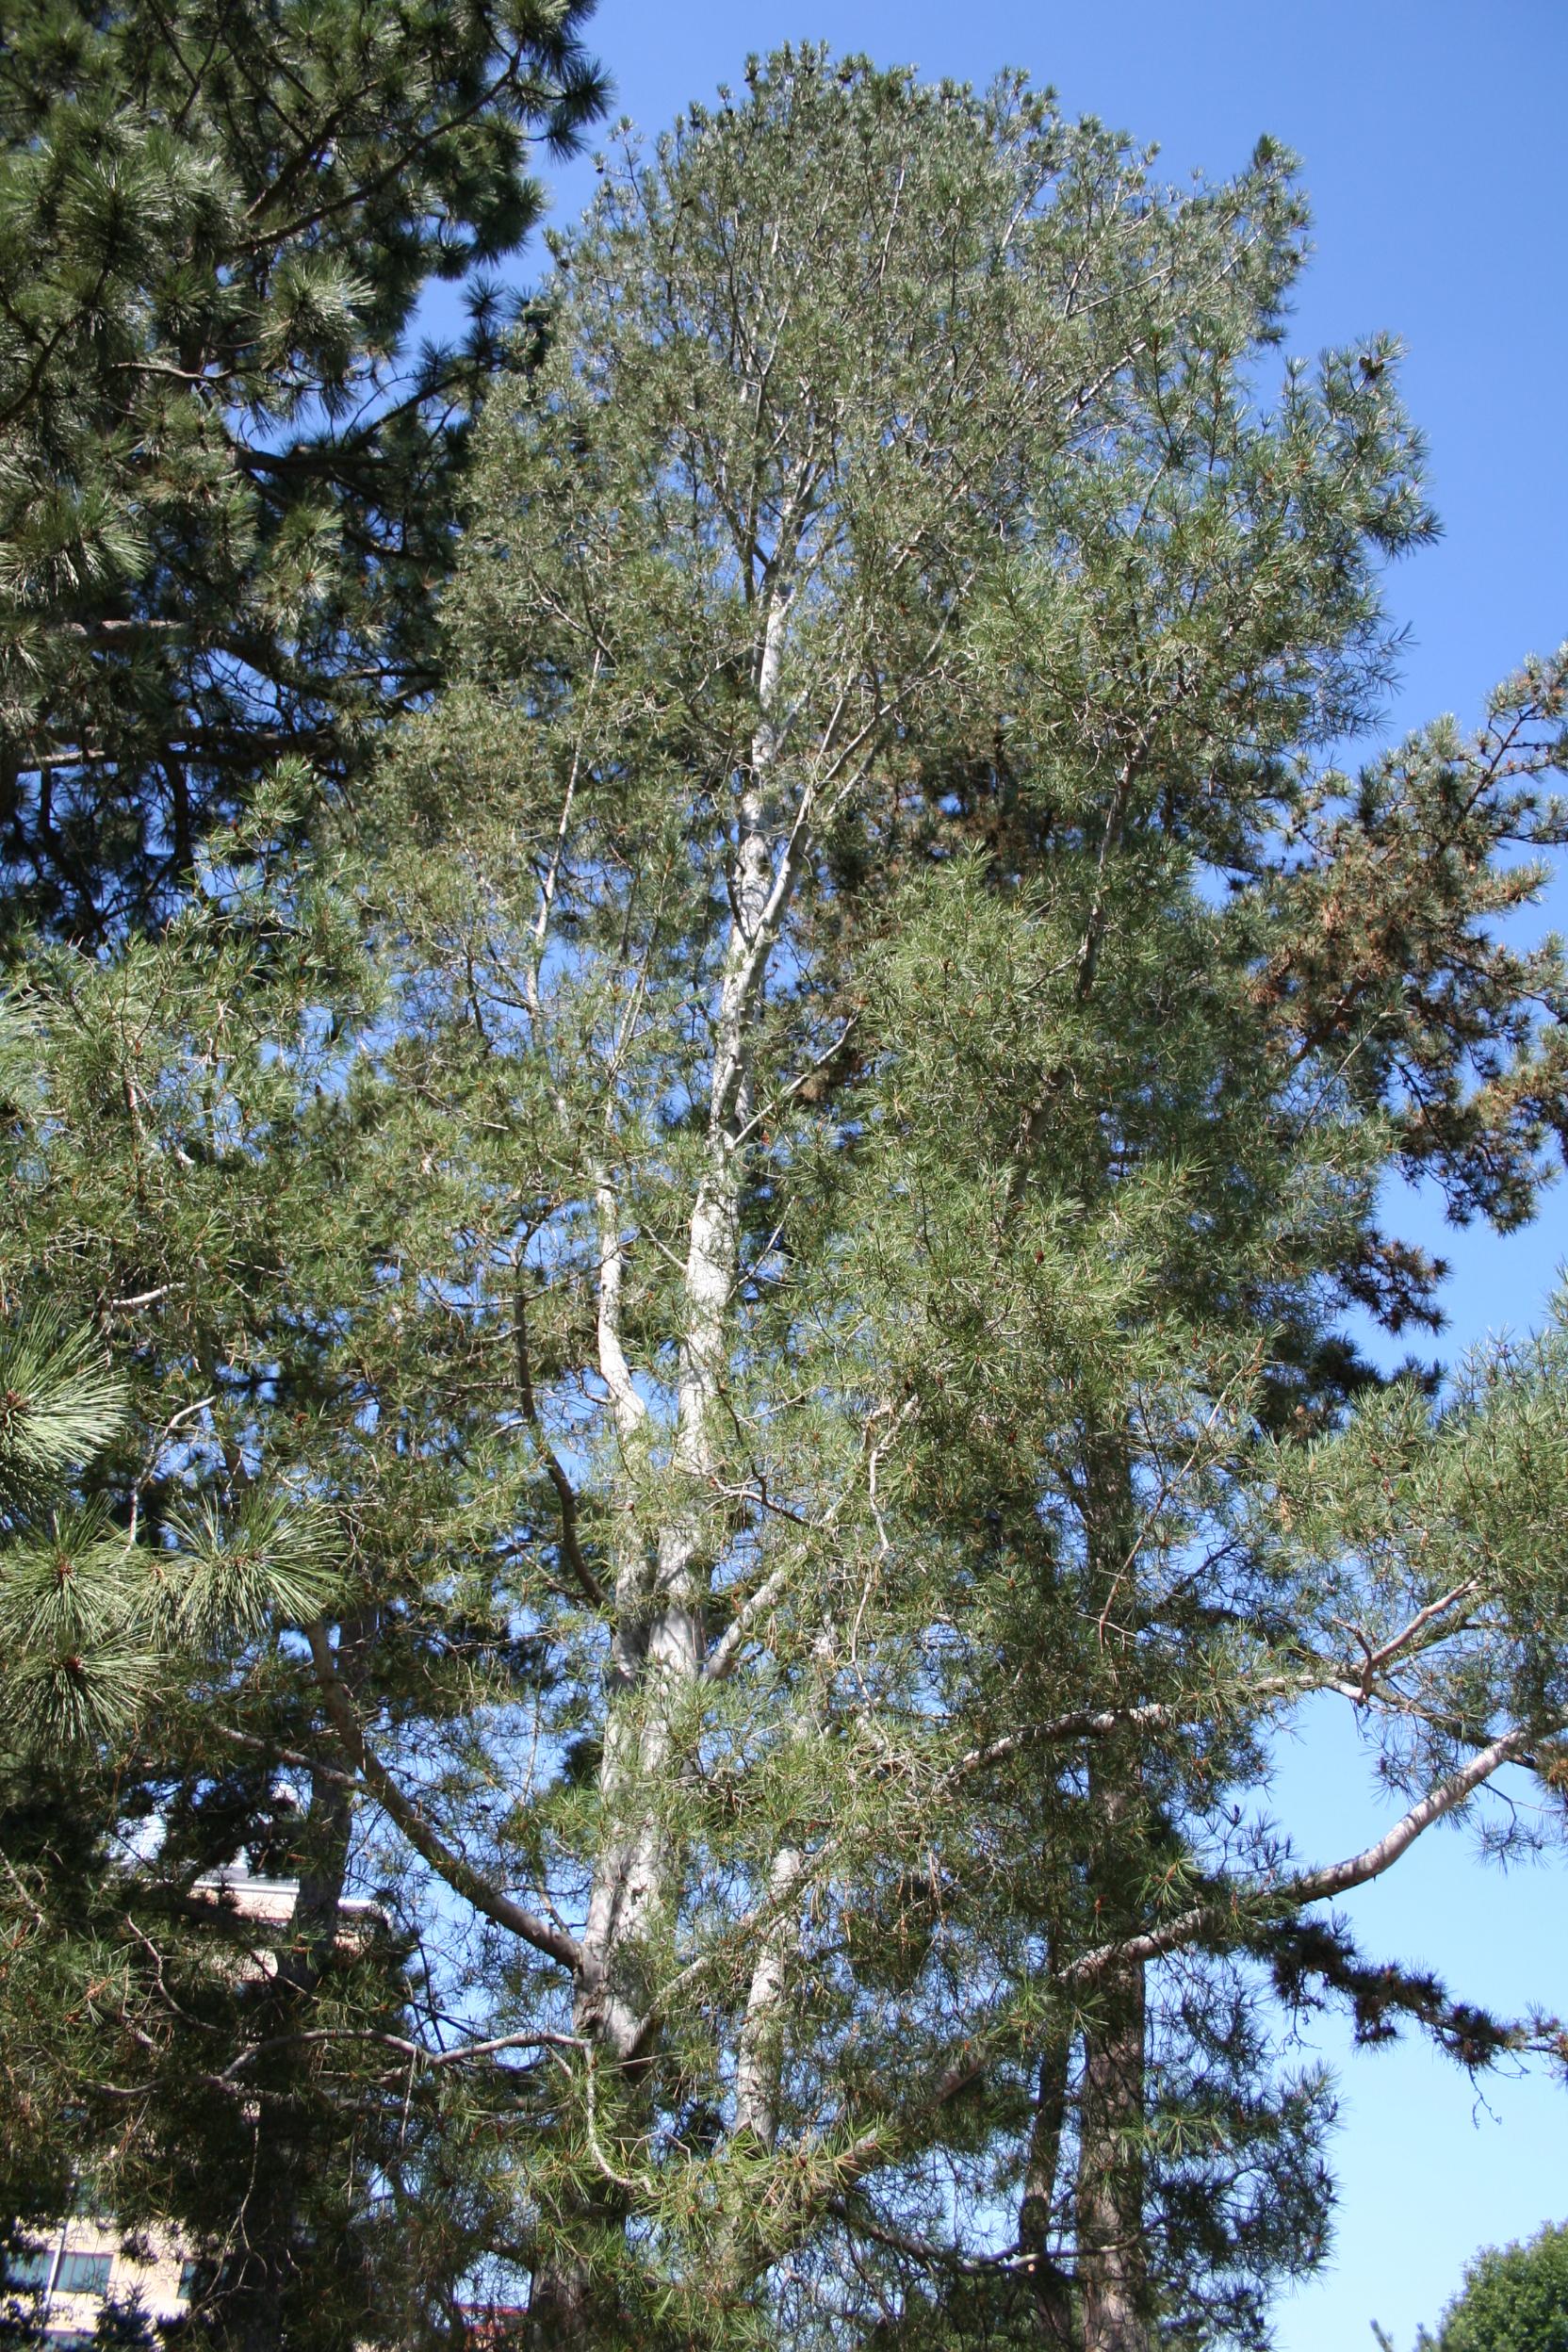 pine tree's canopy